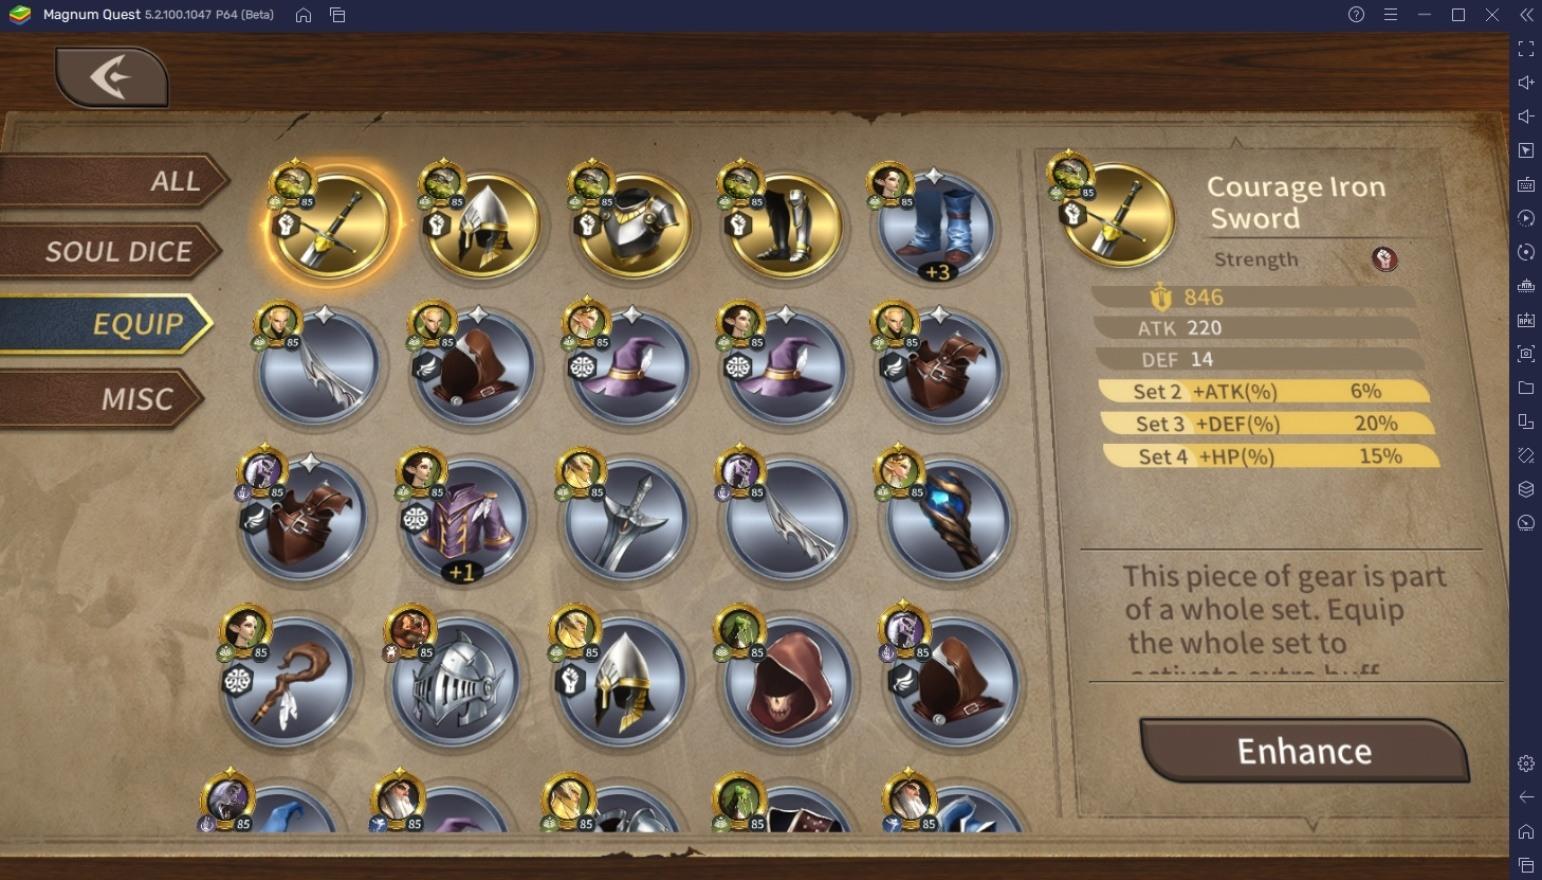 دليل BlueStacks للمبتدئين للعب Magnum Quest